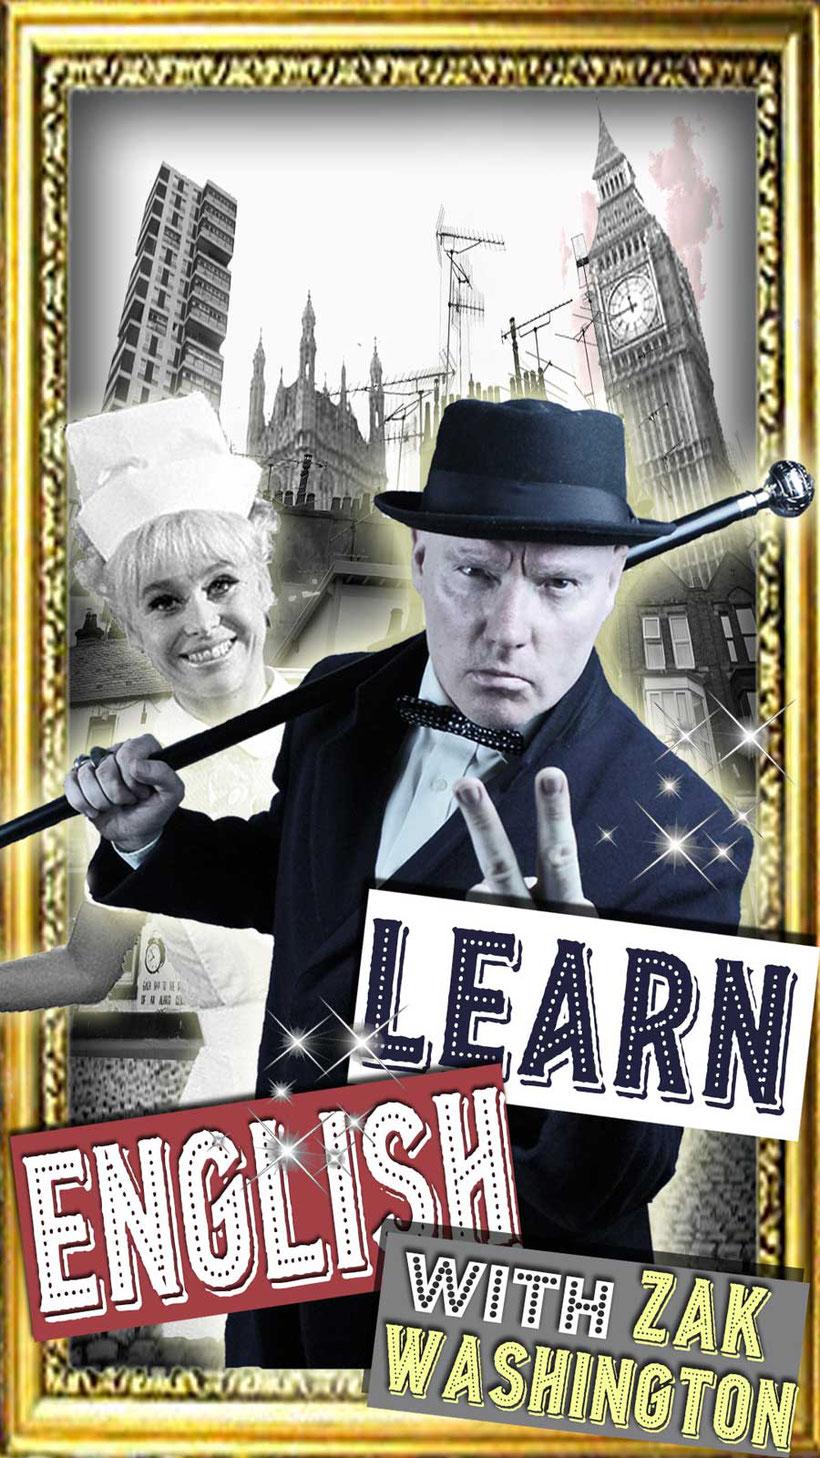 Learn English with Zak Washington - graphic of London skyline with Barbara Windsor by Language Unlimited